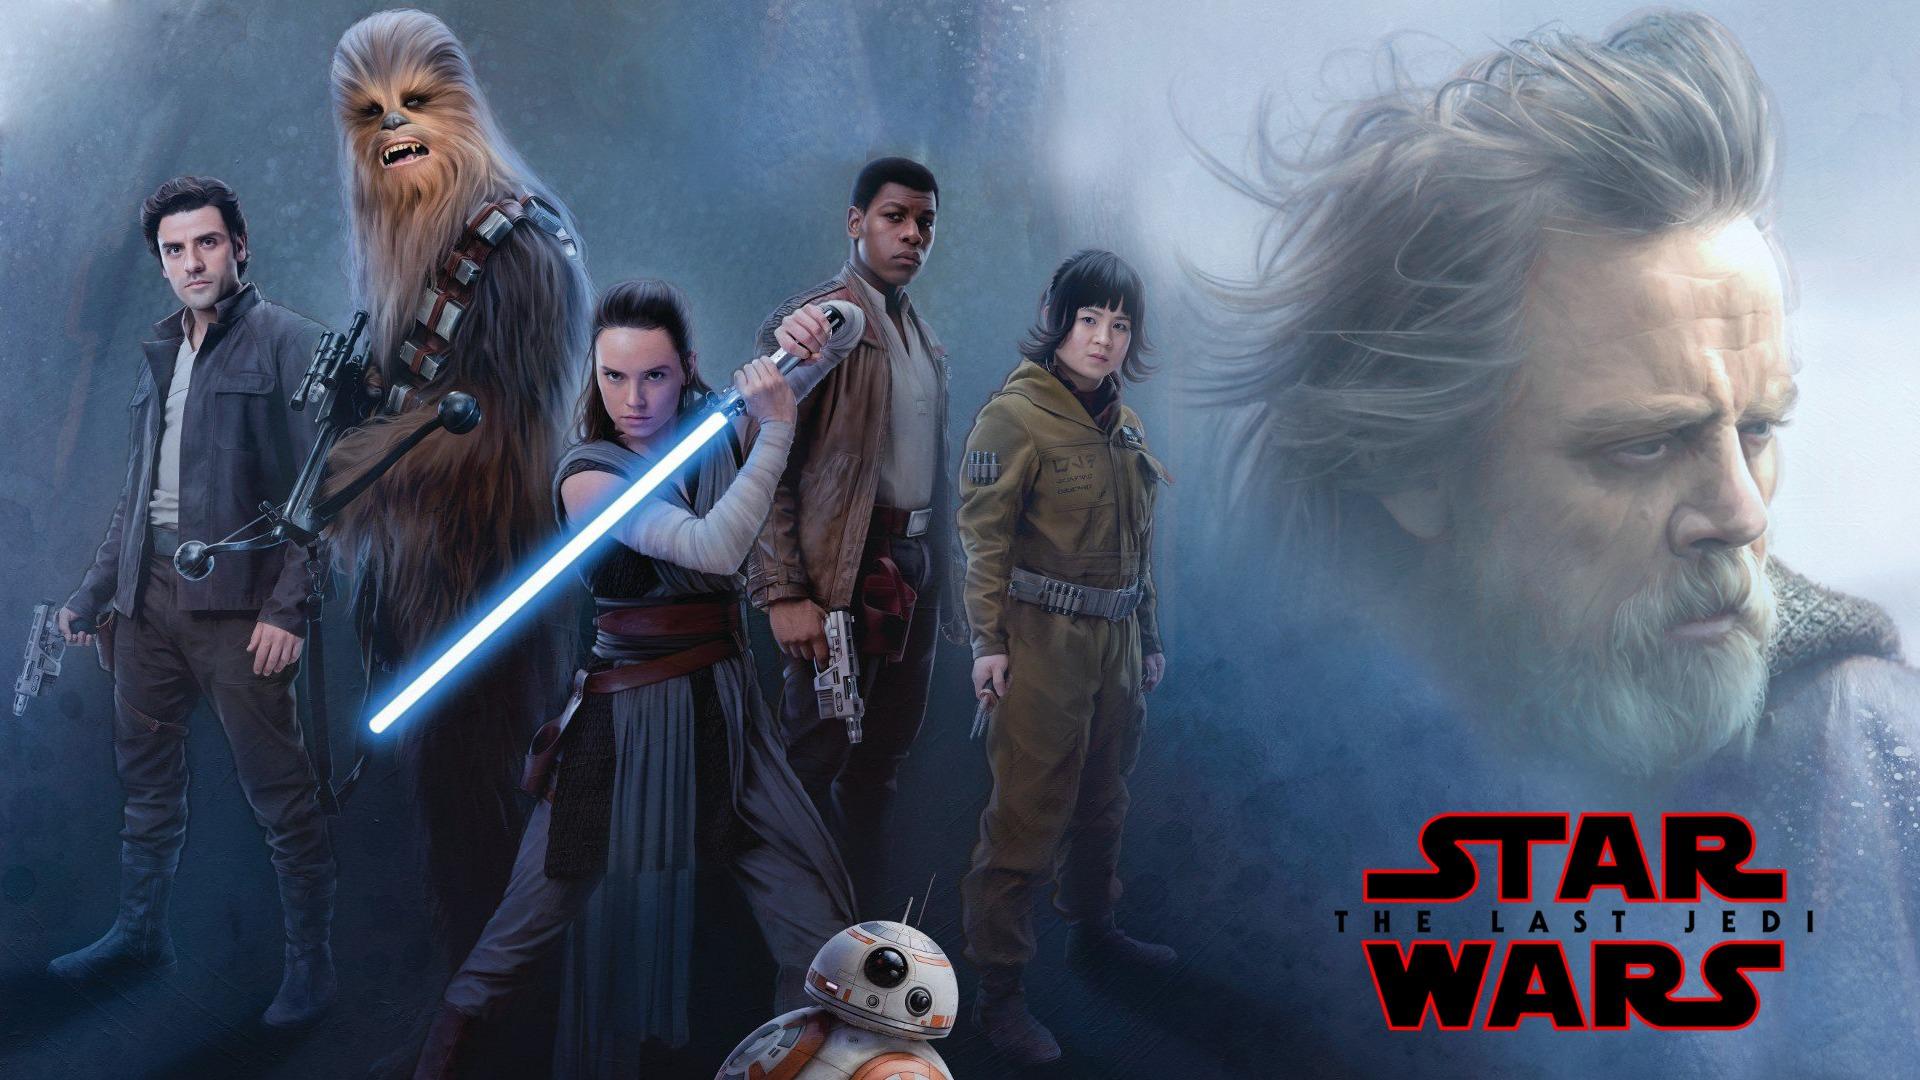 1920x1200 Star Wars Jedi Rey Daisy Ridley And Luke Skywalker